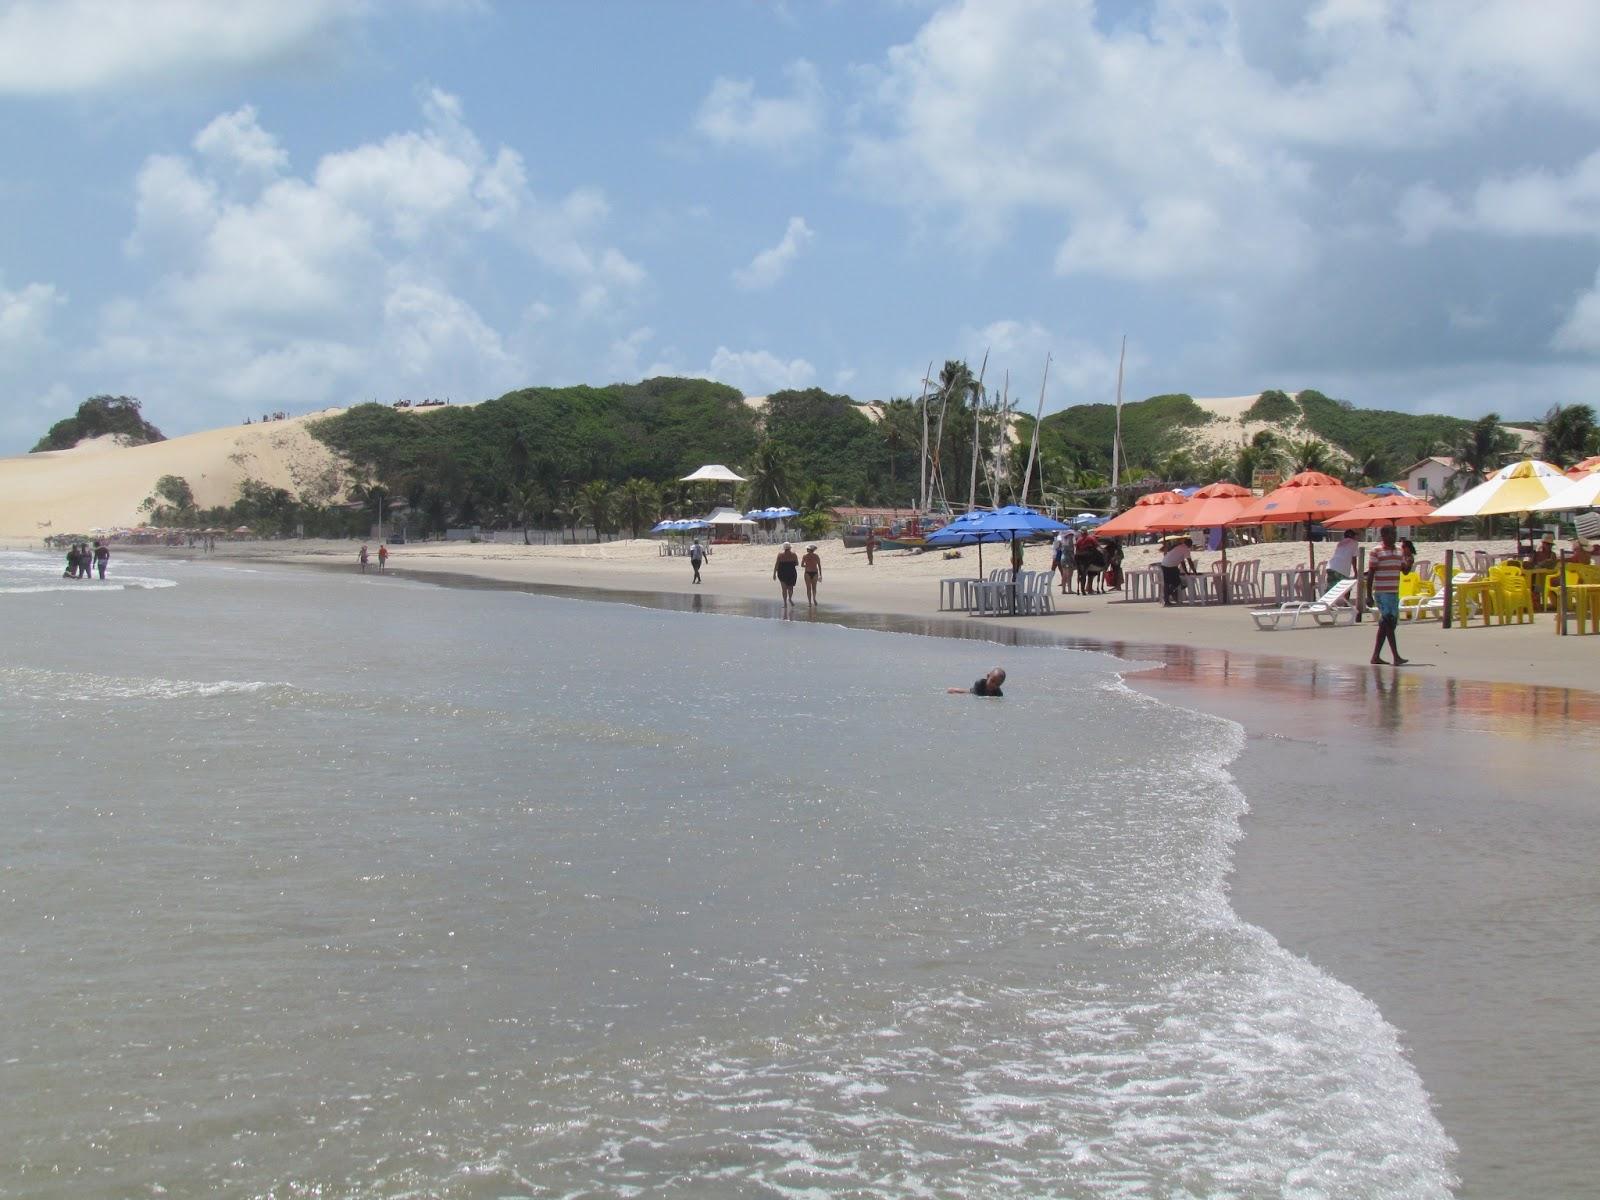 Barracas a beira mar de Genipabú-RN